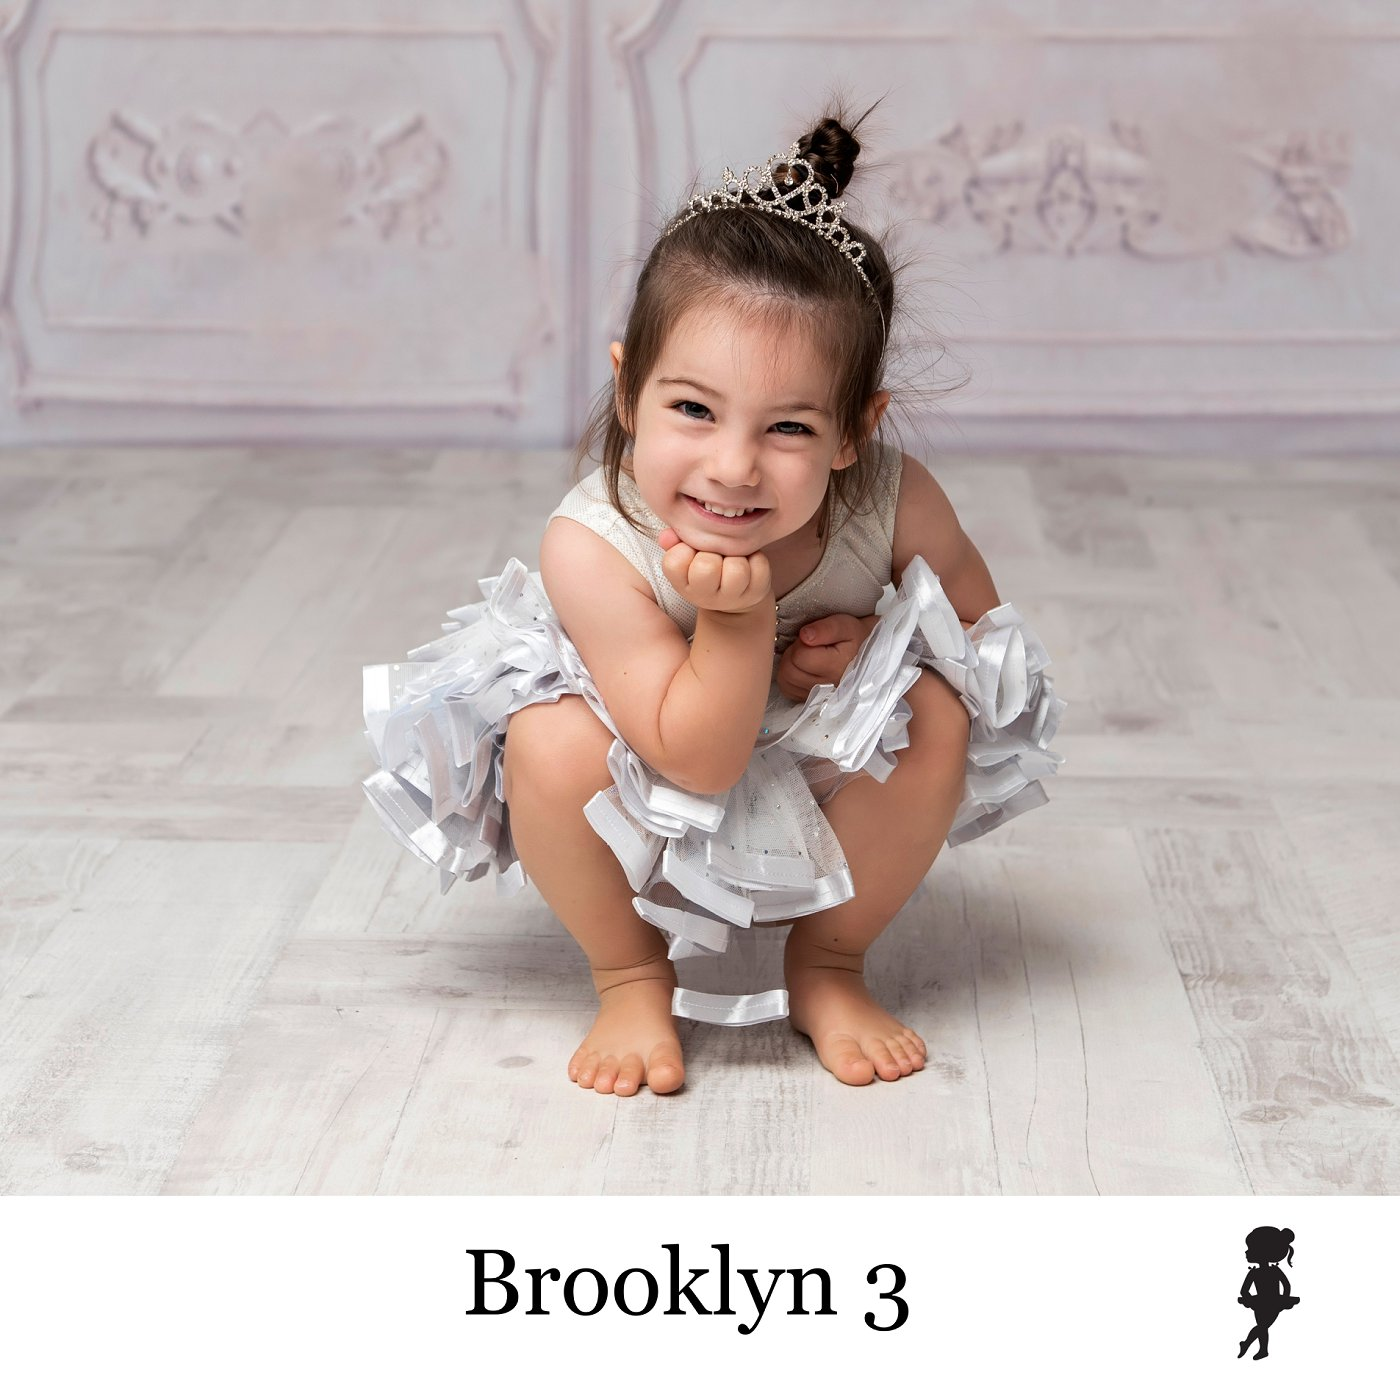 LB1819-Brooklyn 3.jpg